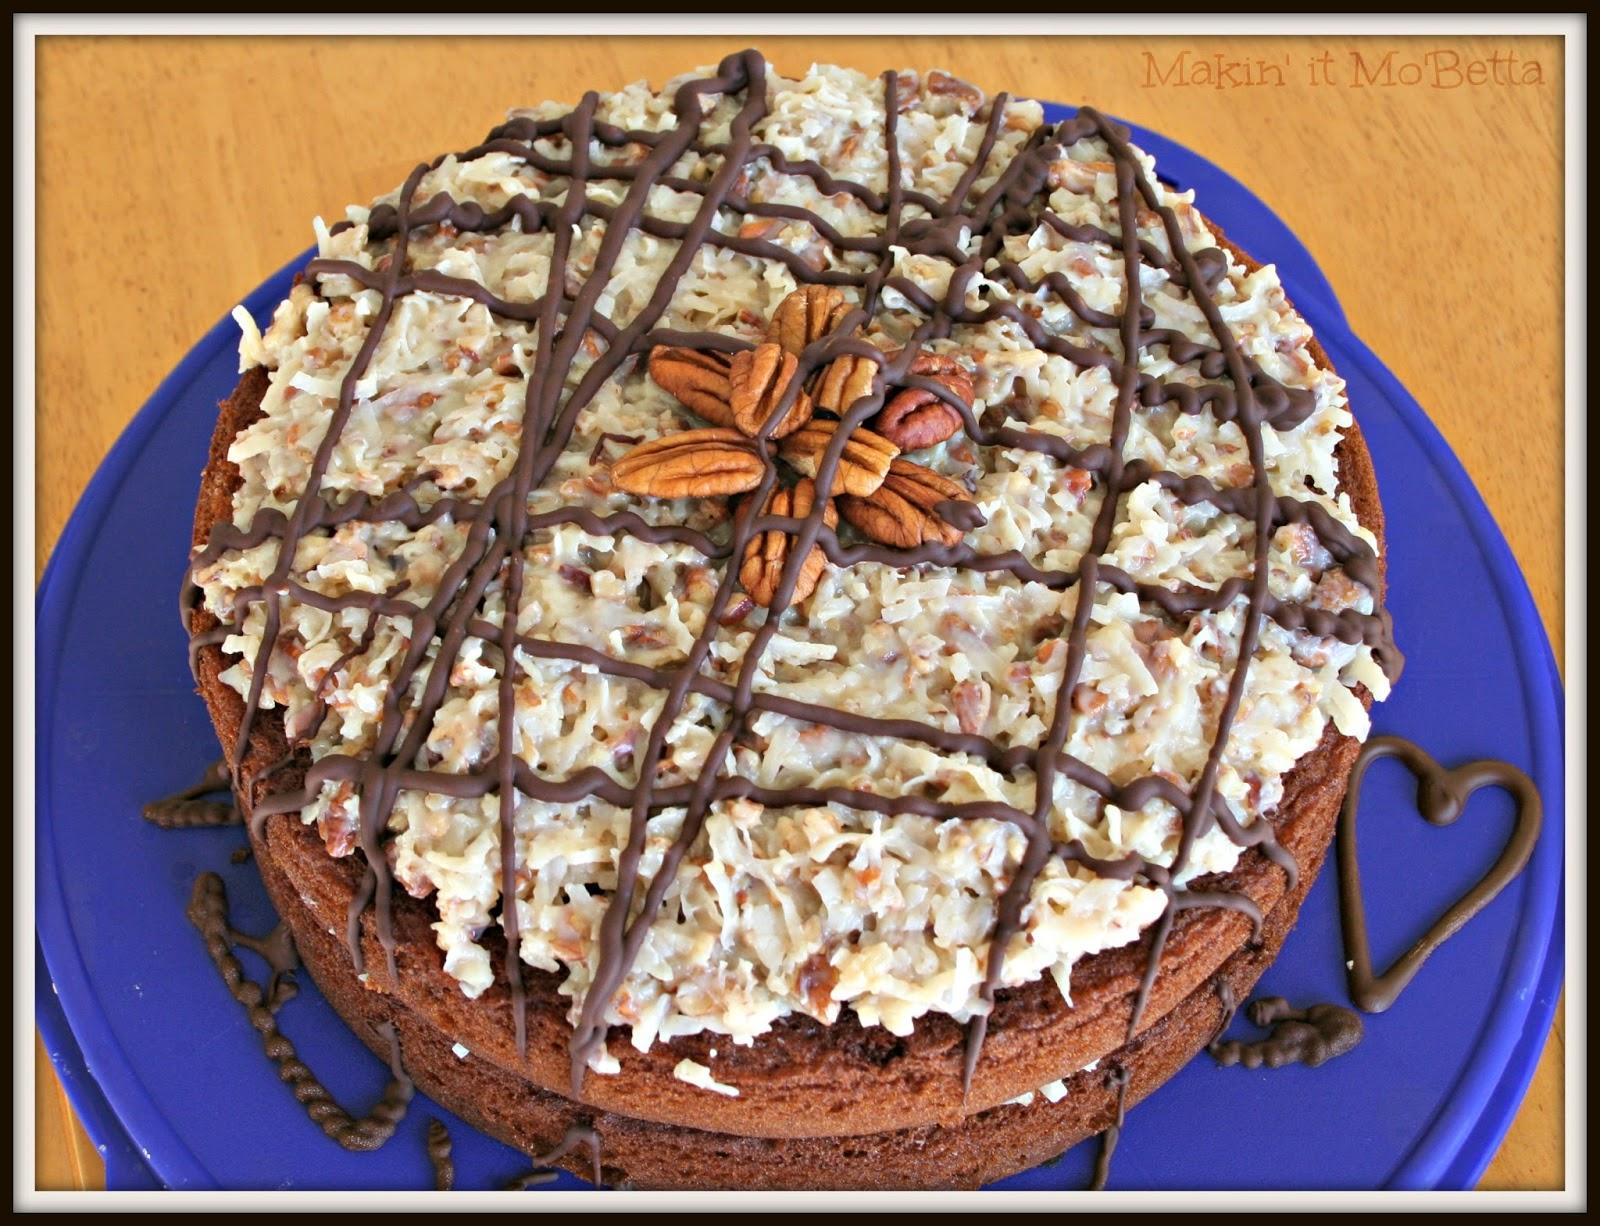 German Chocolate Cake - Makin' it Mo'Betta